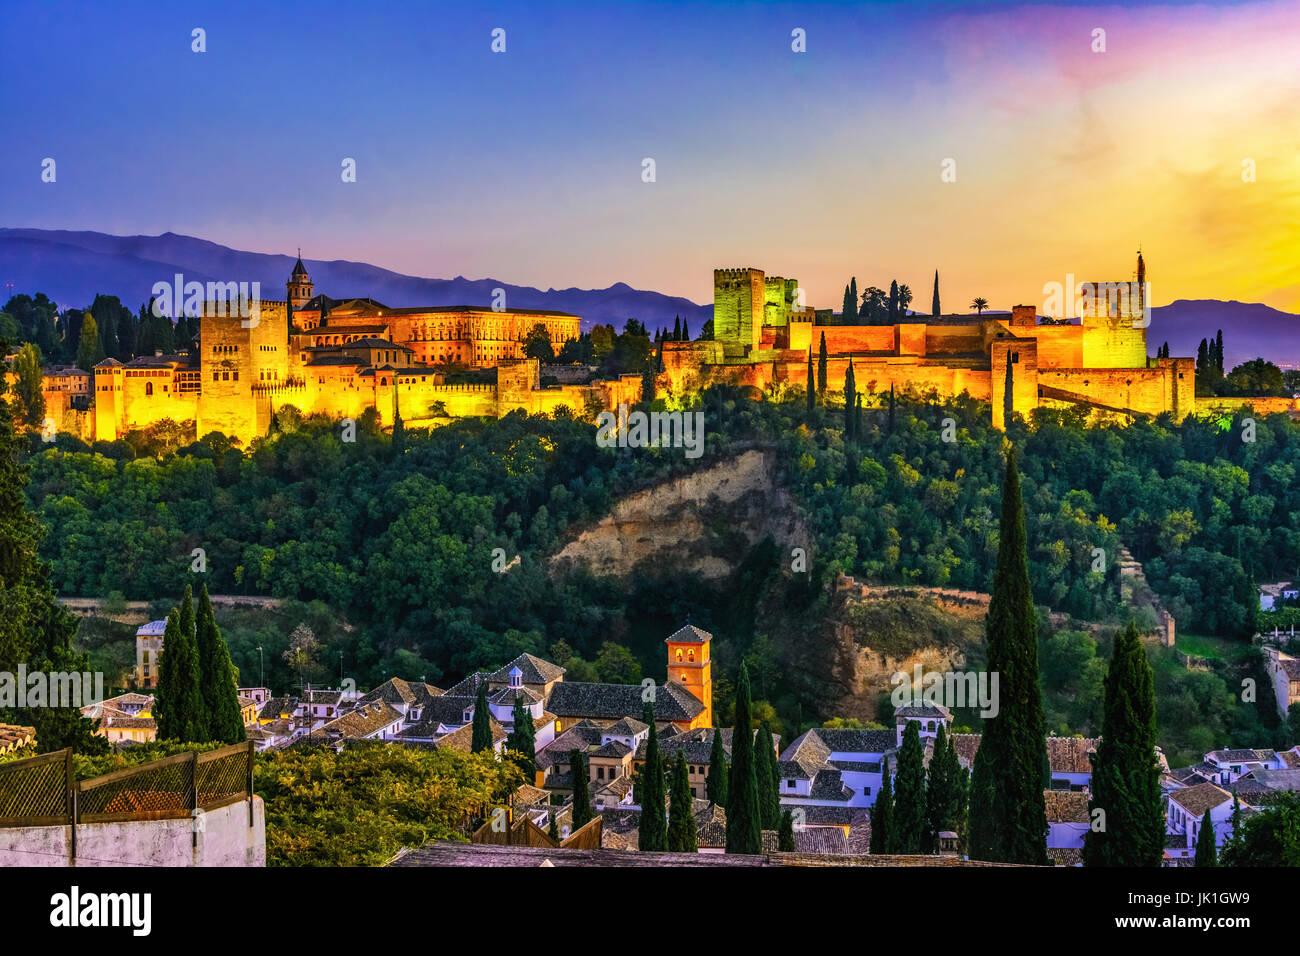 Alhambra, Granada, España Imagen De Stock